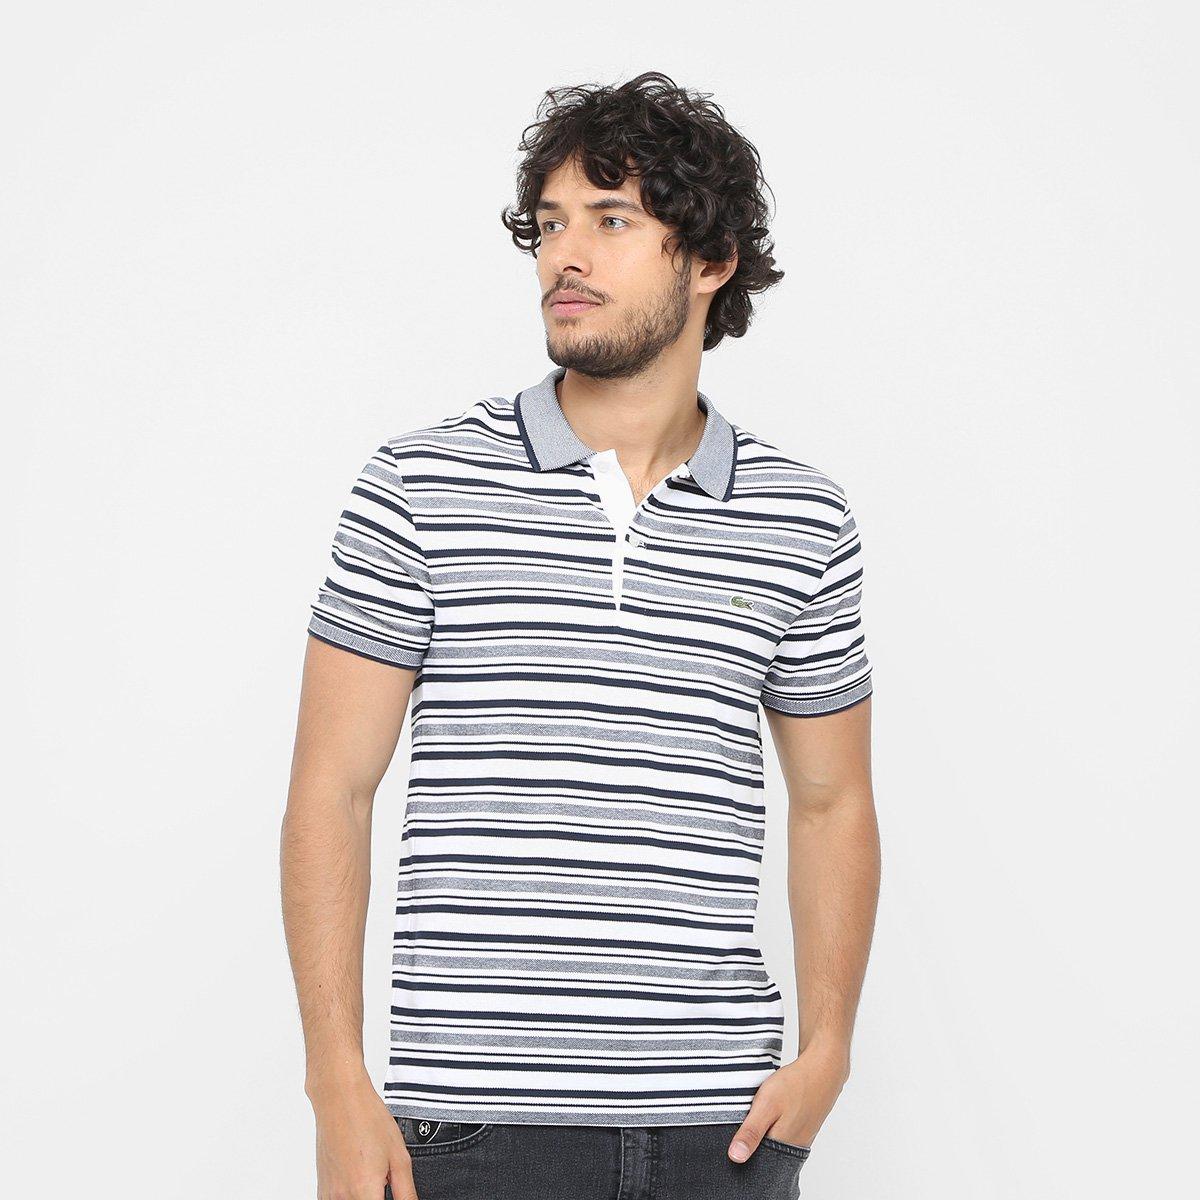 39975ca7d82 Camisa Polo Lacoste Piquet Caviar Listras Masculina - Compre Agora ...